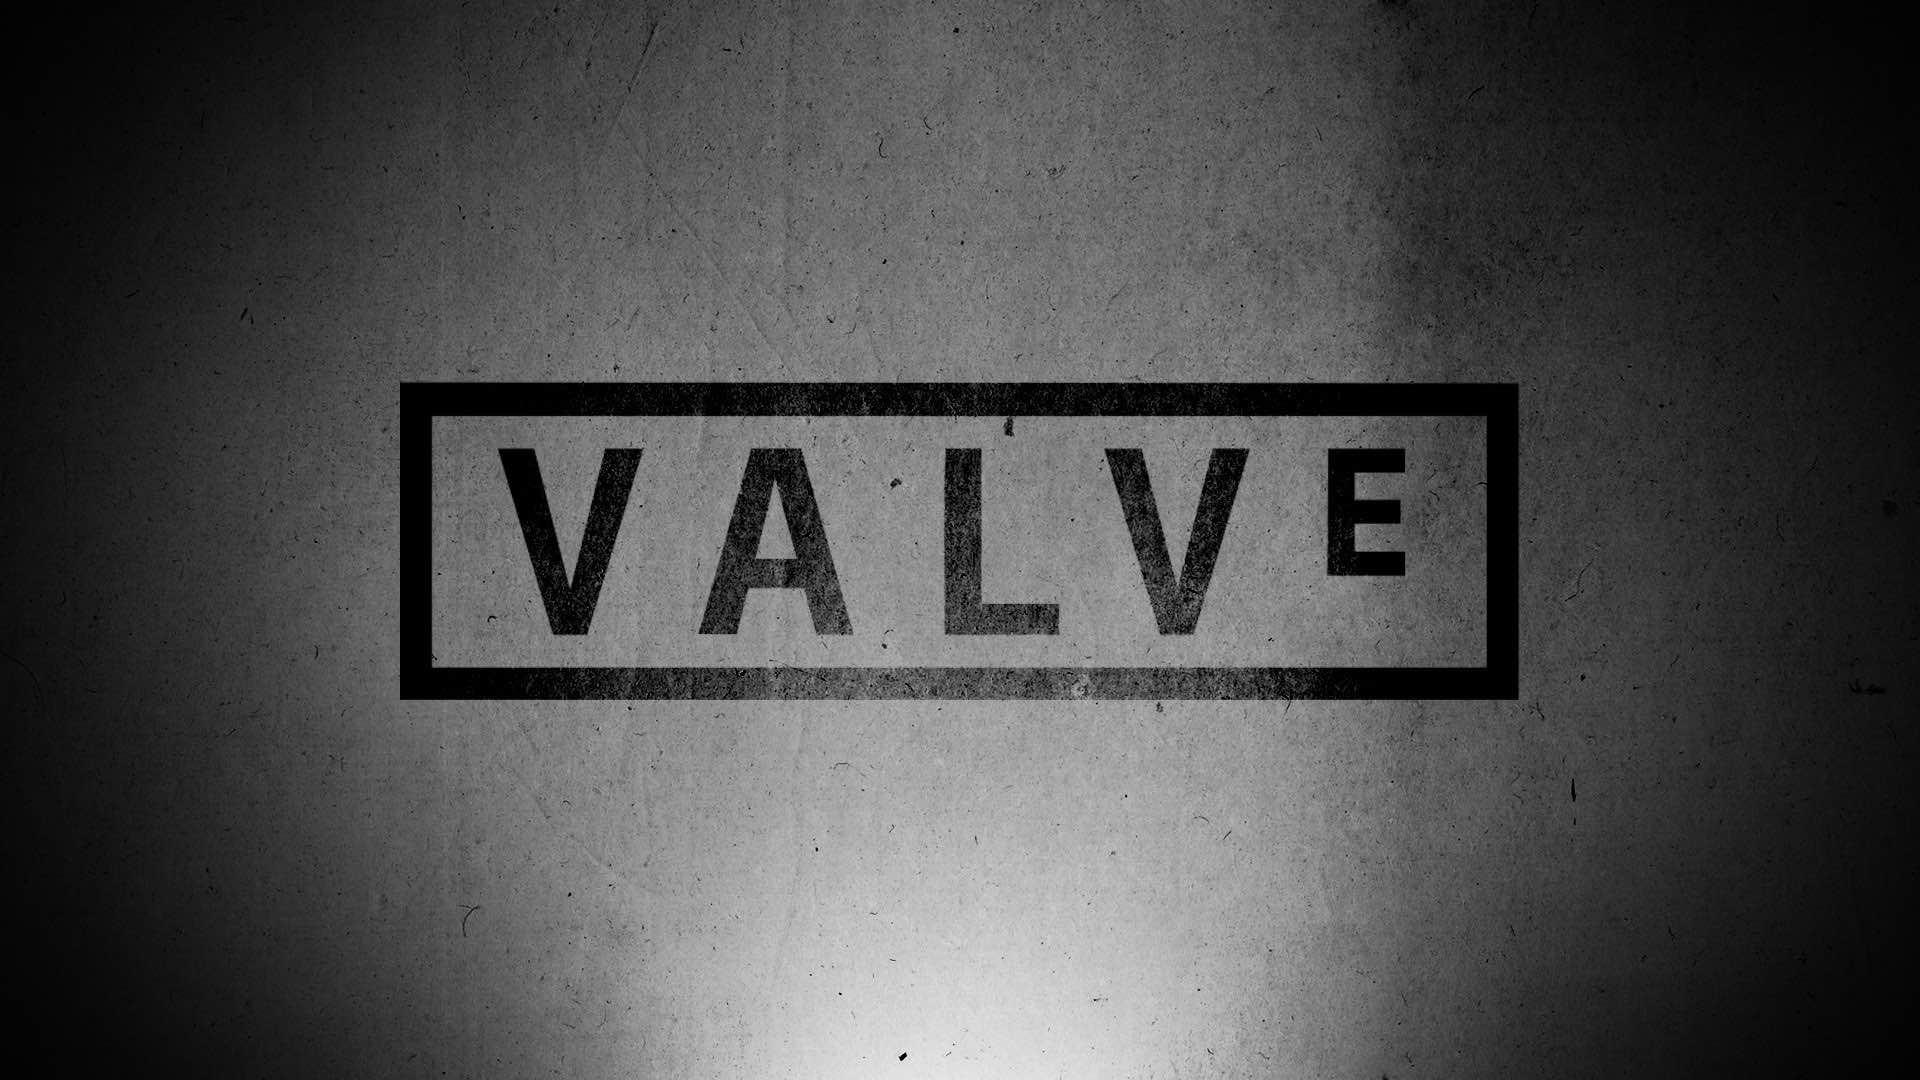 Valve разрабатывает сразу 3 полноценные VR-игры